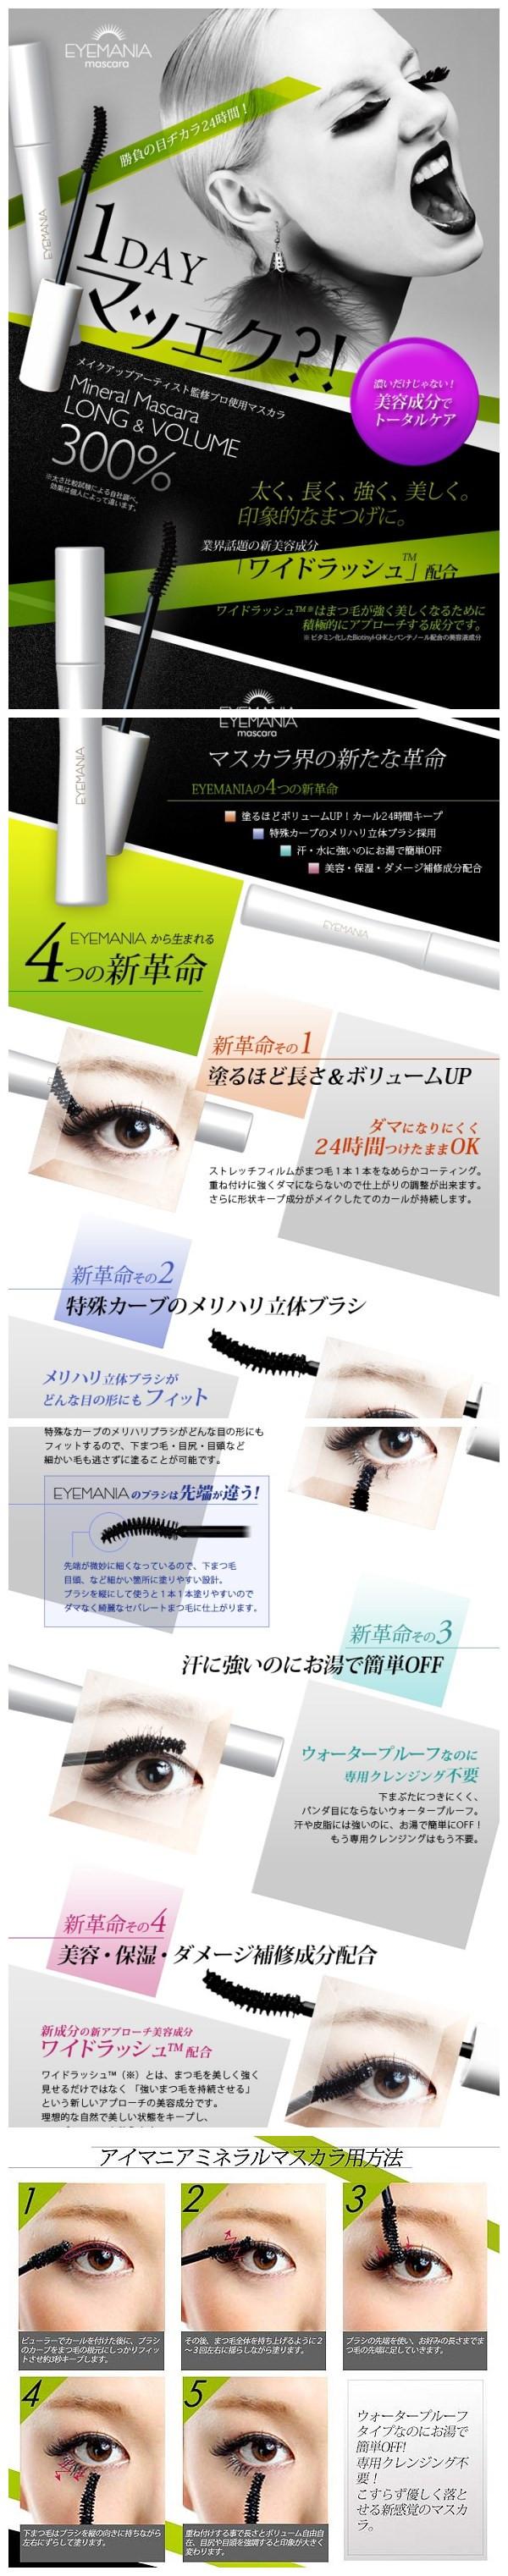 Eyemania Mascara